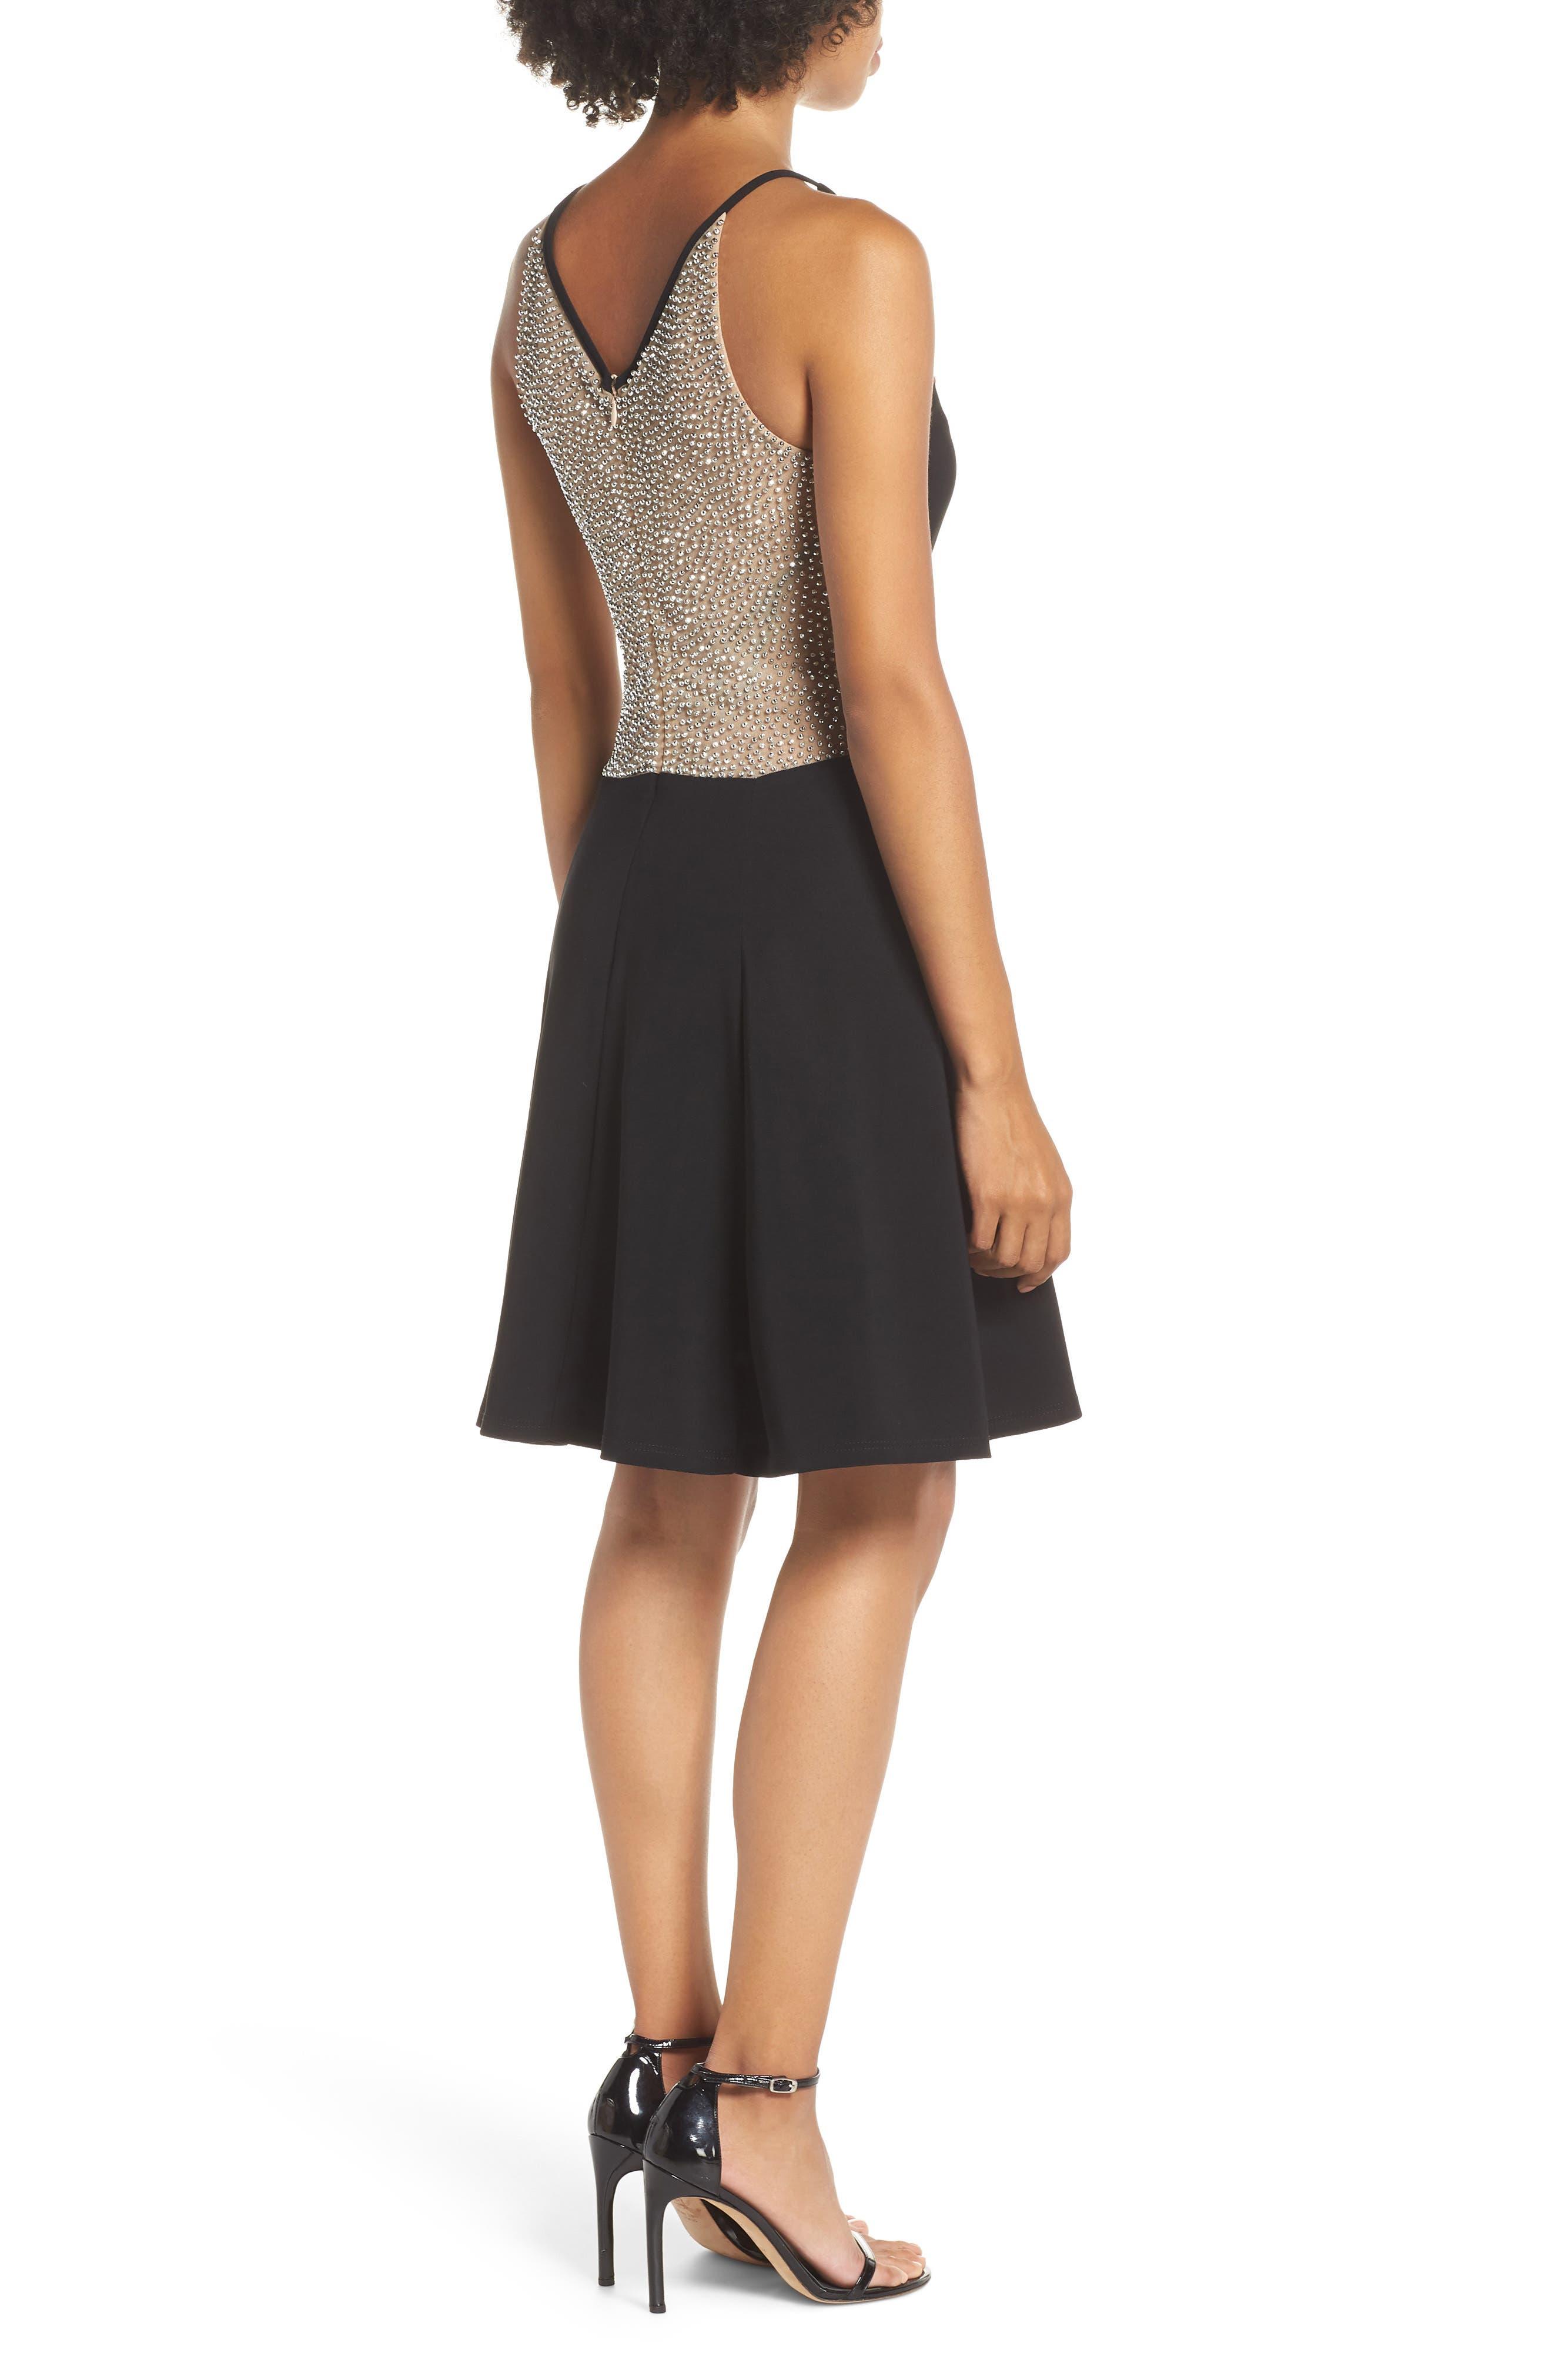 Deep V-Neck Skater Dress,                             Alternate thumbnail 2, color,                             BLACK/ / NUDE/ SILVER